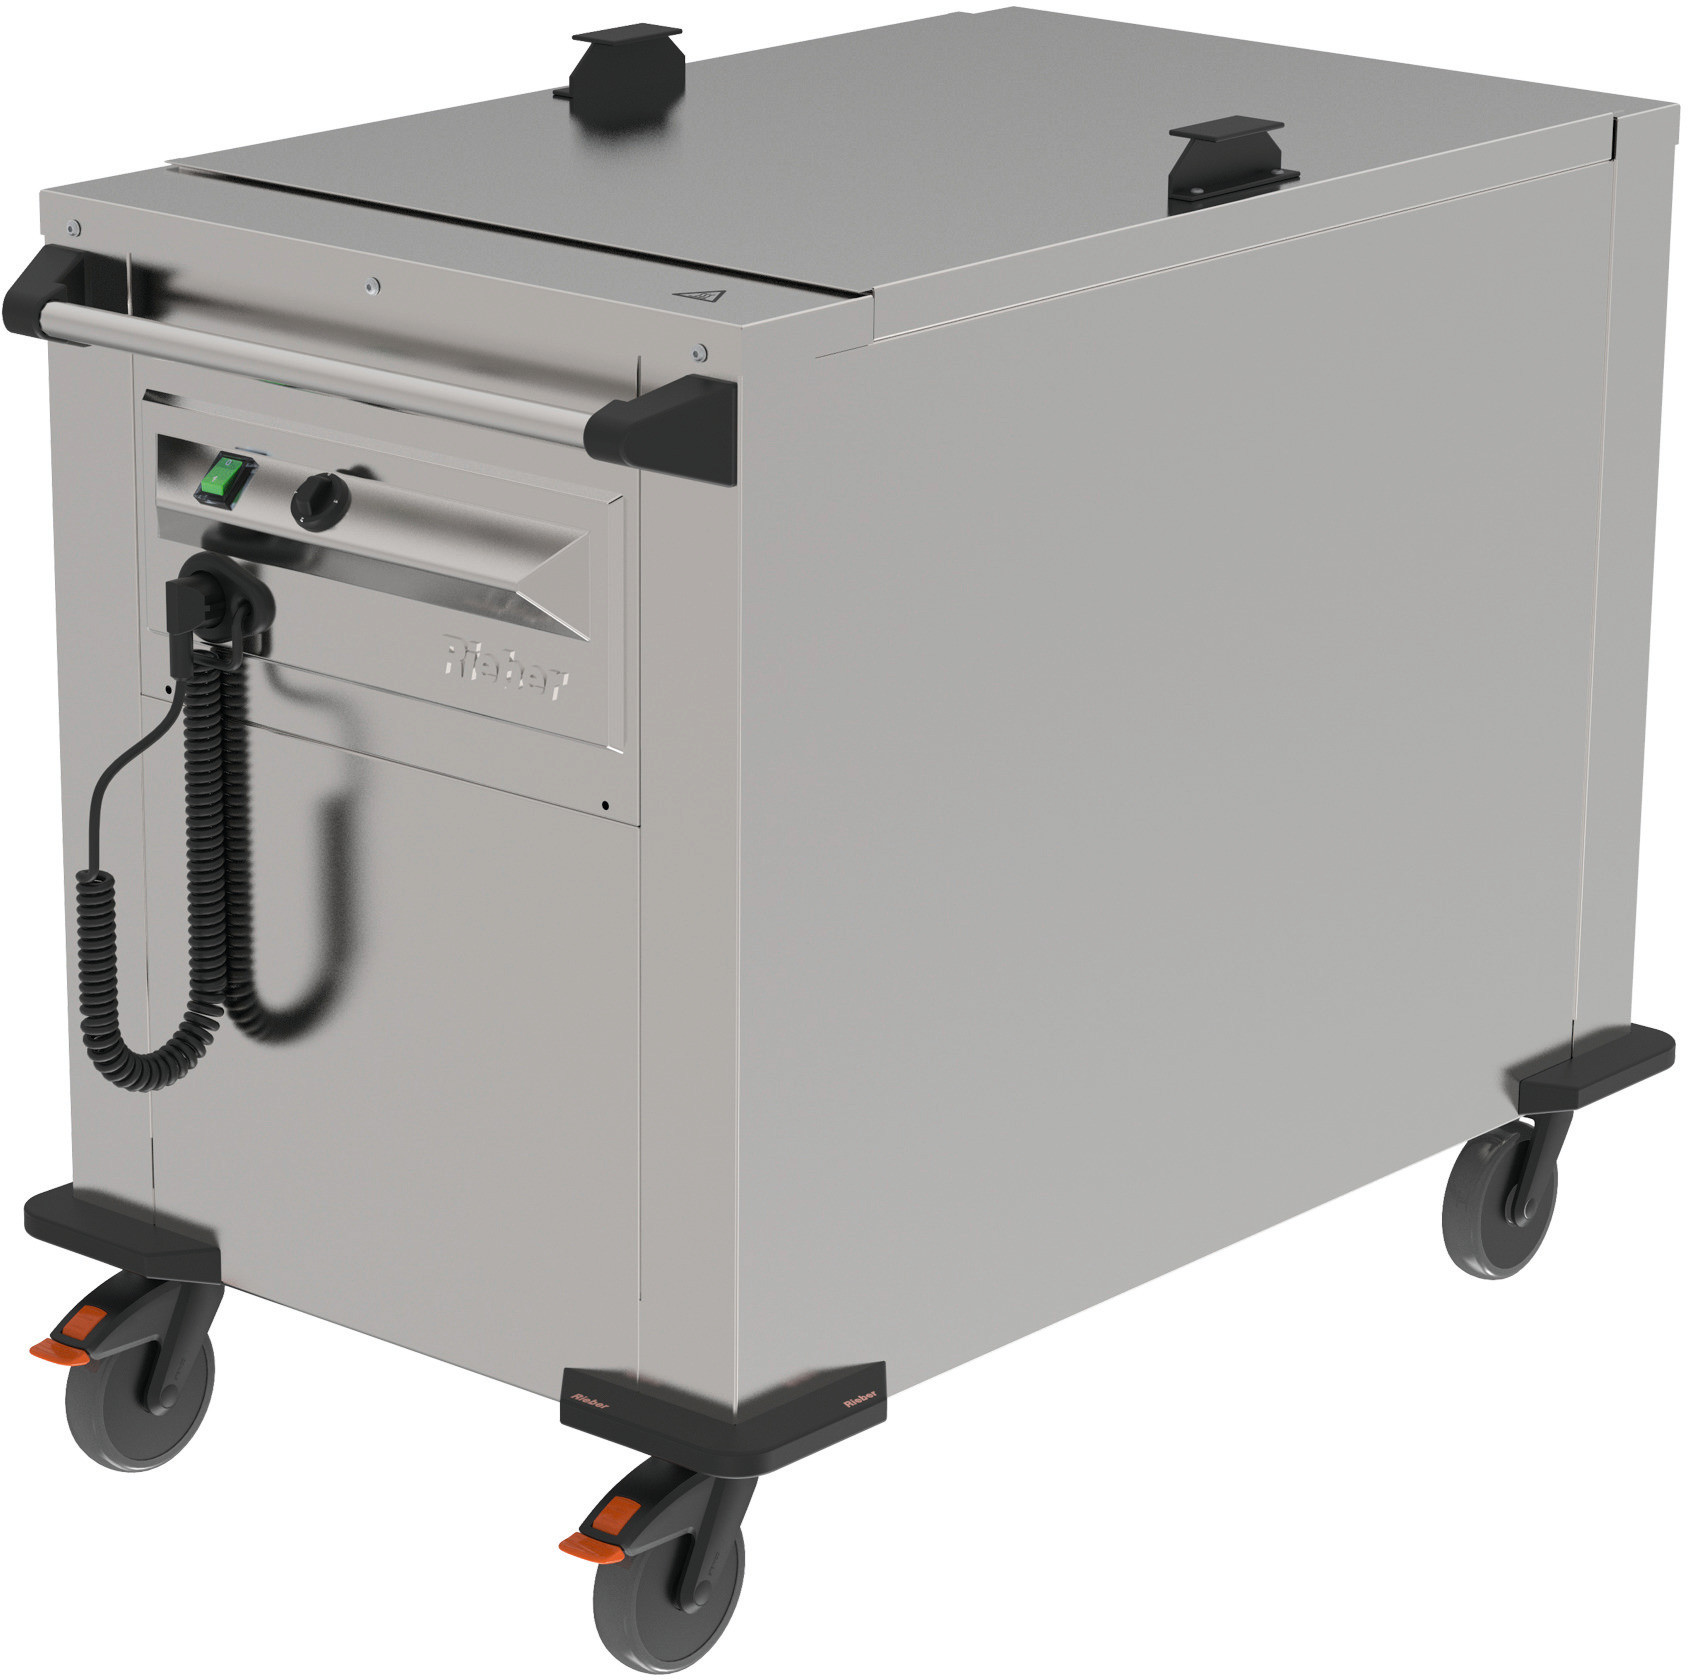 Plattformstapler fahrbar / Umluft beheizt / 535 x 660 mm / Stapelhöhe 600 mm